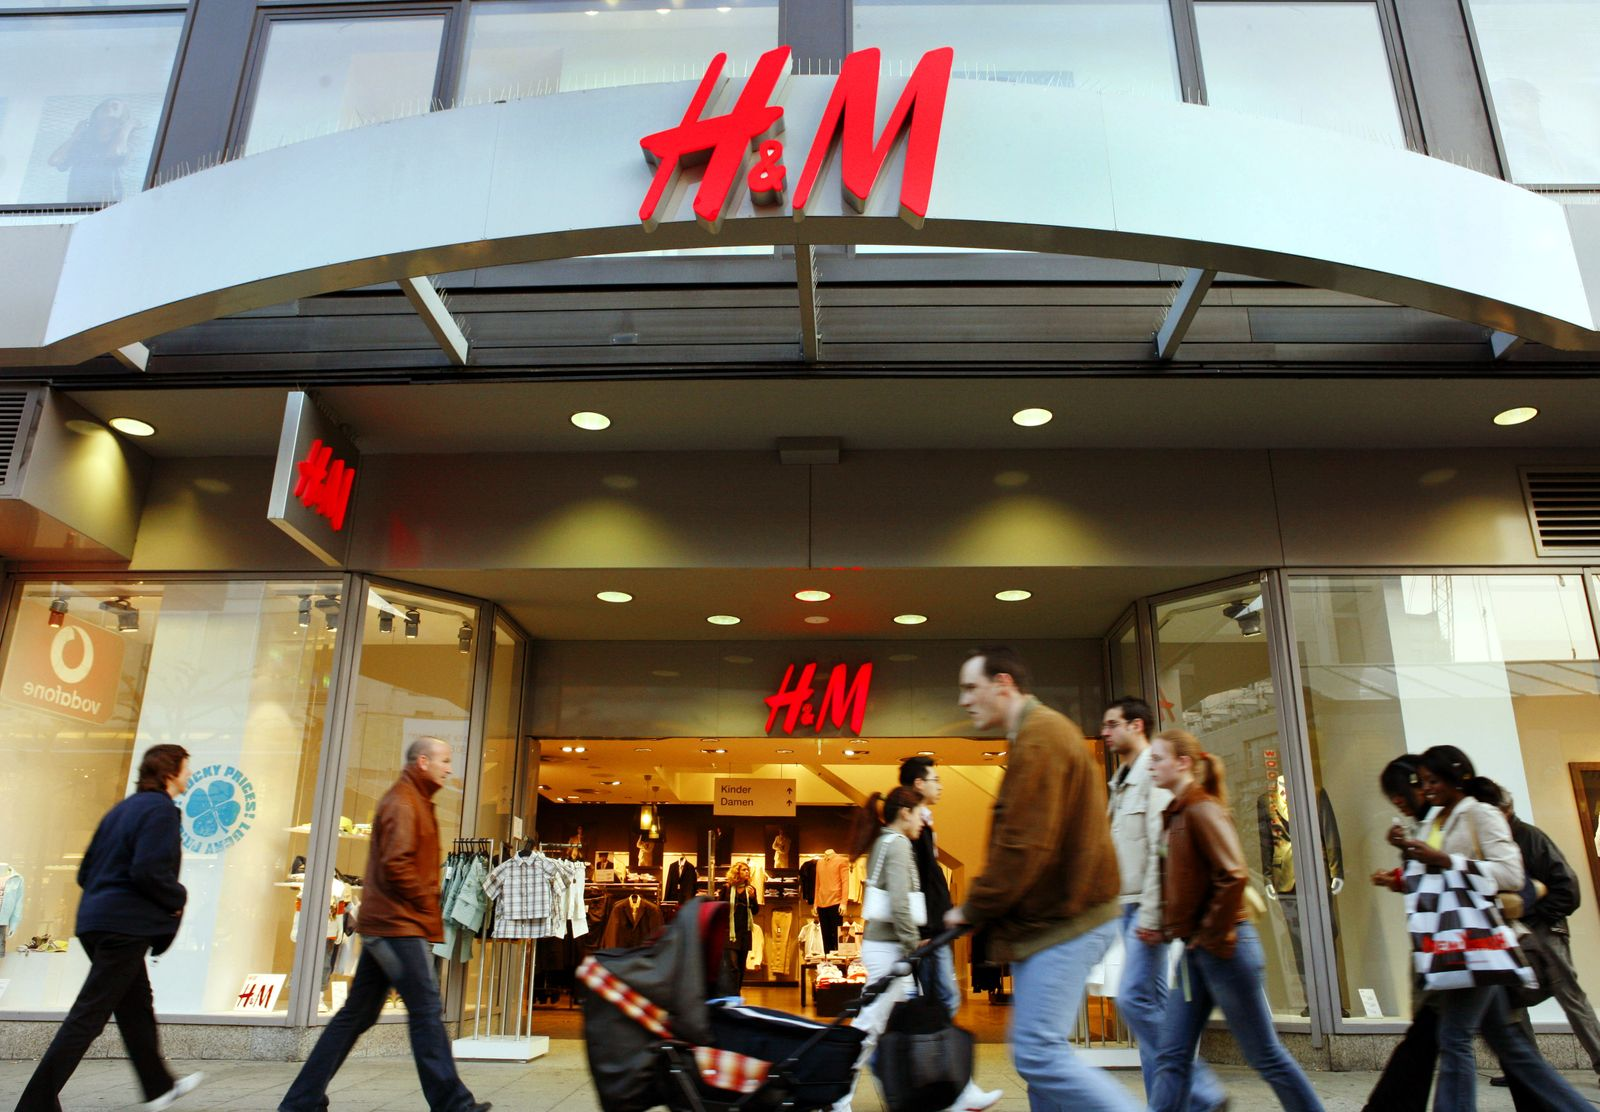 H&M steigert Gewinn - überraschend schwächere Verkäufe